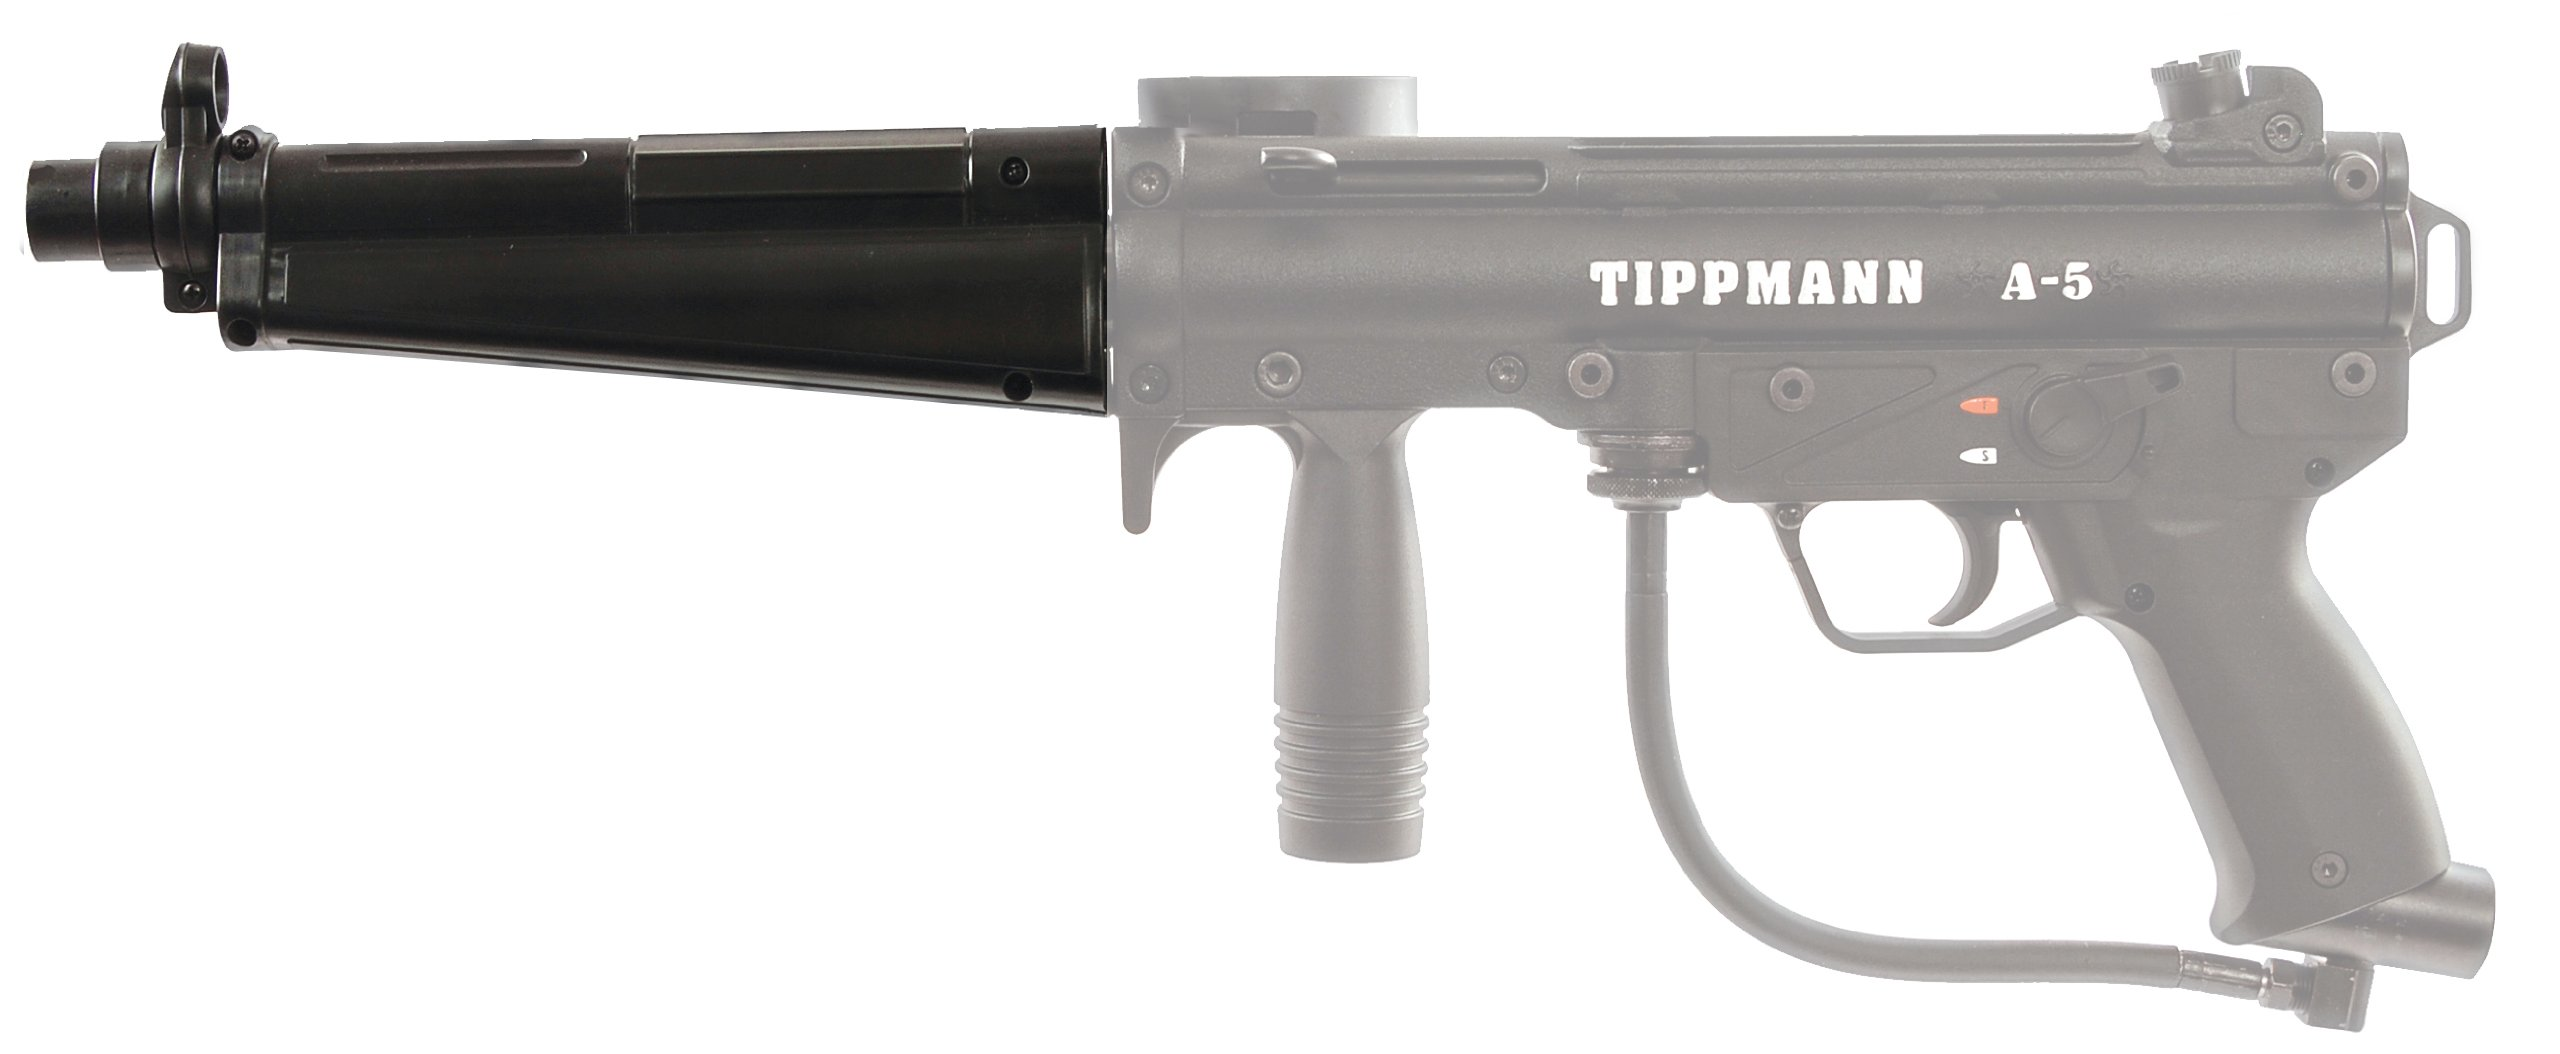 Tippmann A-5 Flatline Barrel with Built in Foregrip by Tippmann